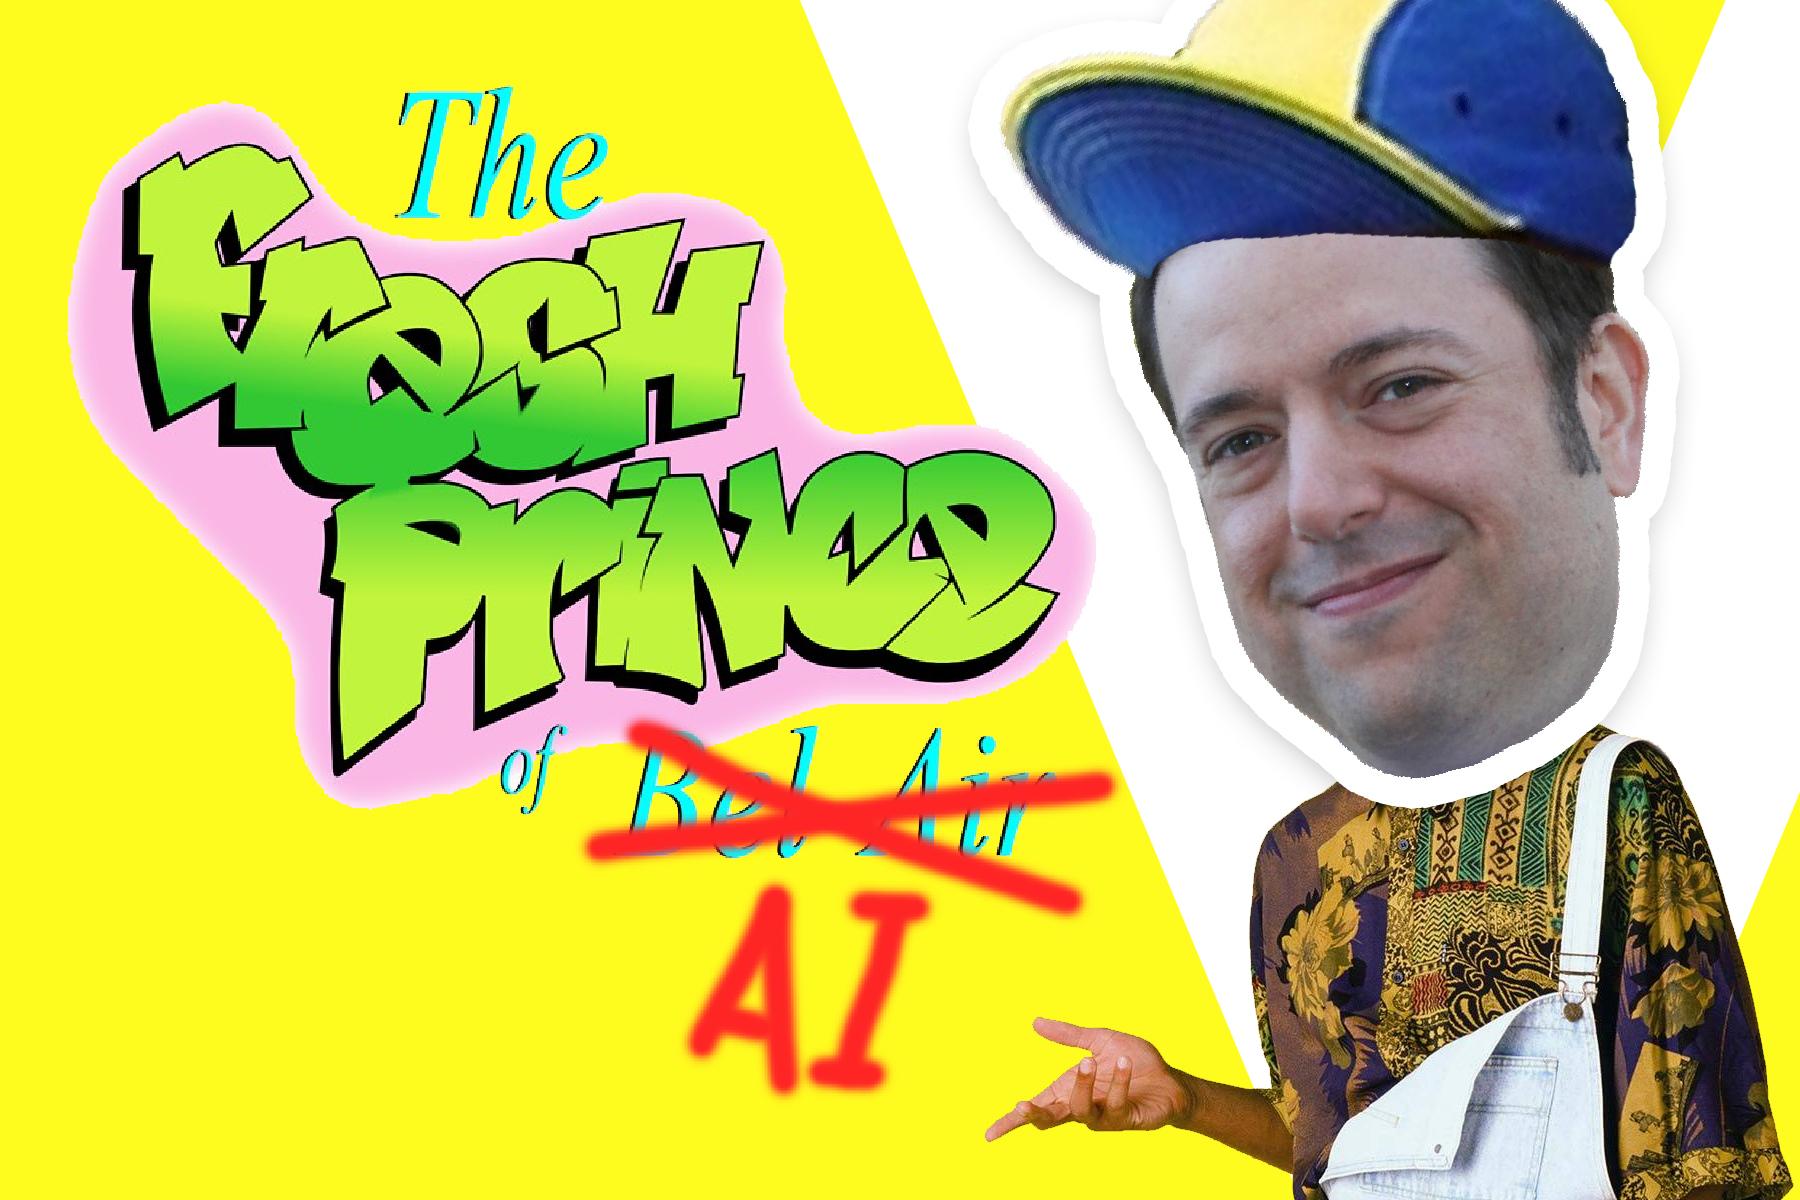 The Fresh Price of AI Frank Schneider of Speakeasy AI